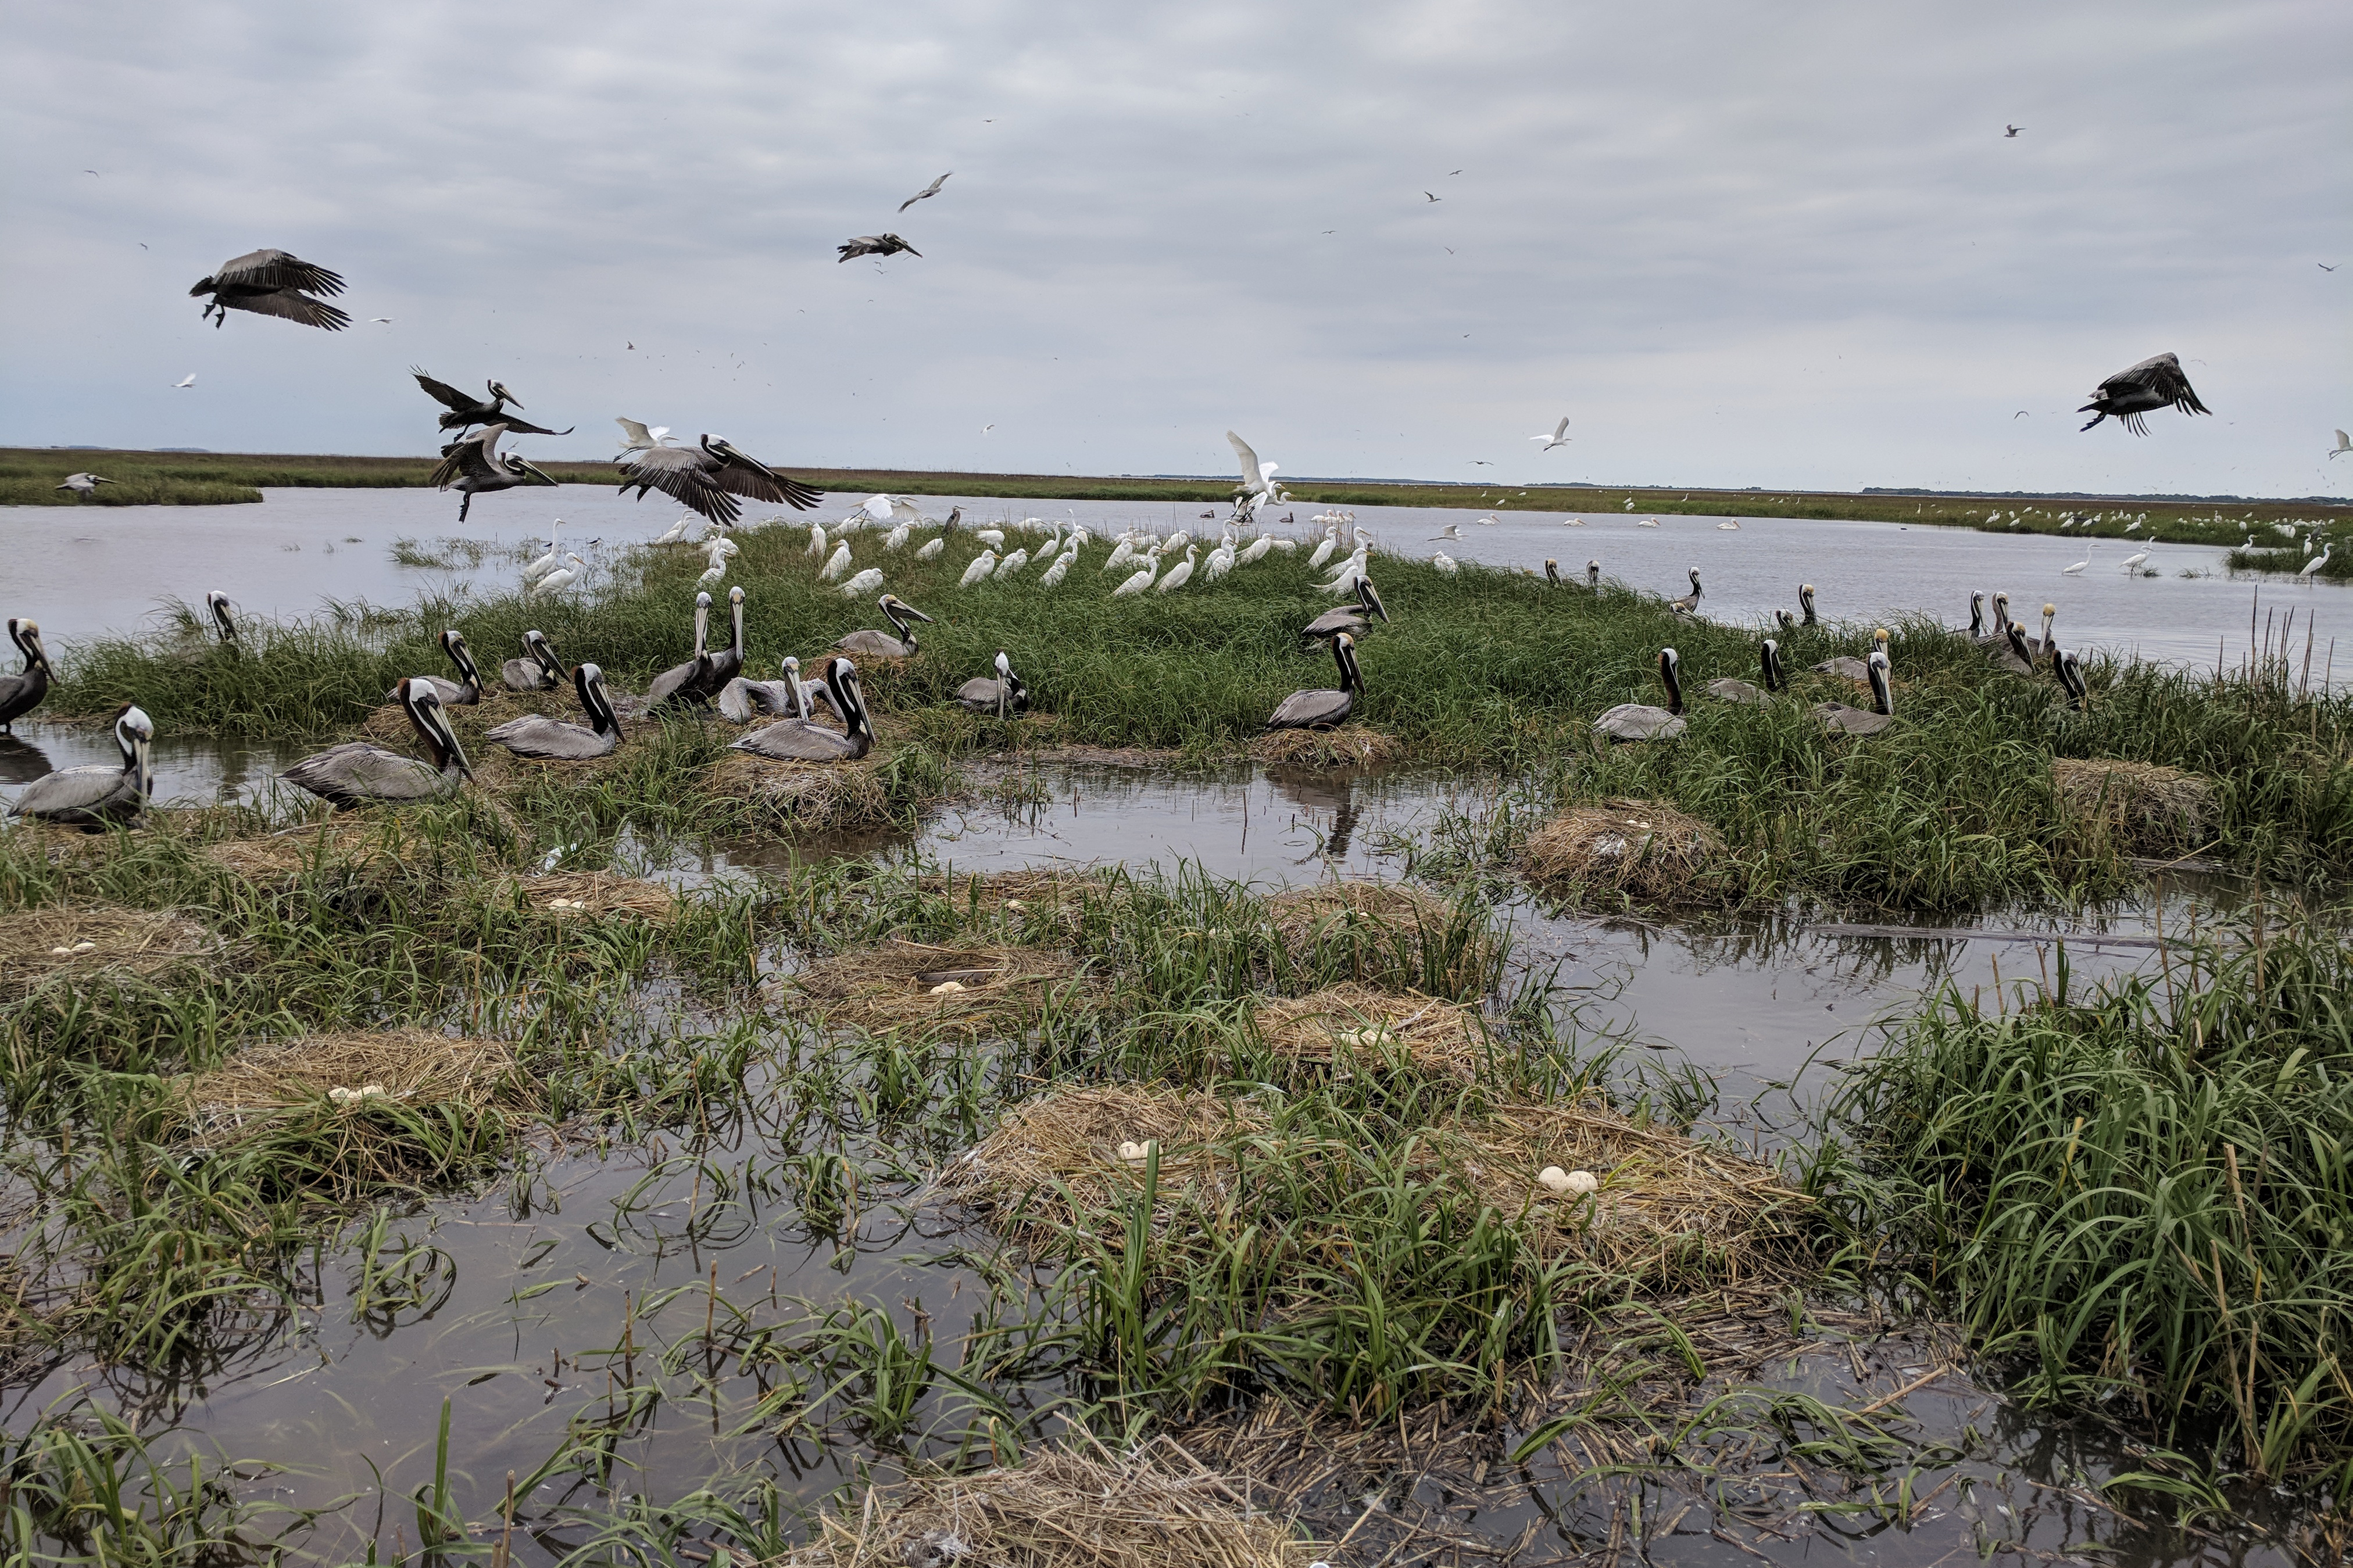 Pelicans nest on and fly over marsh and grass habitat on Louisiana's Rabbit Island.